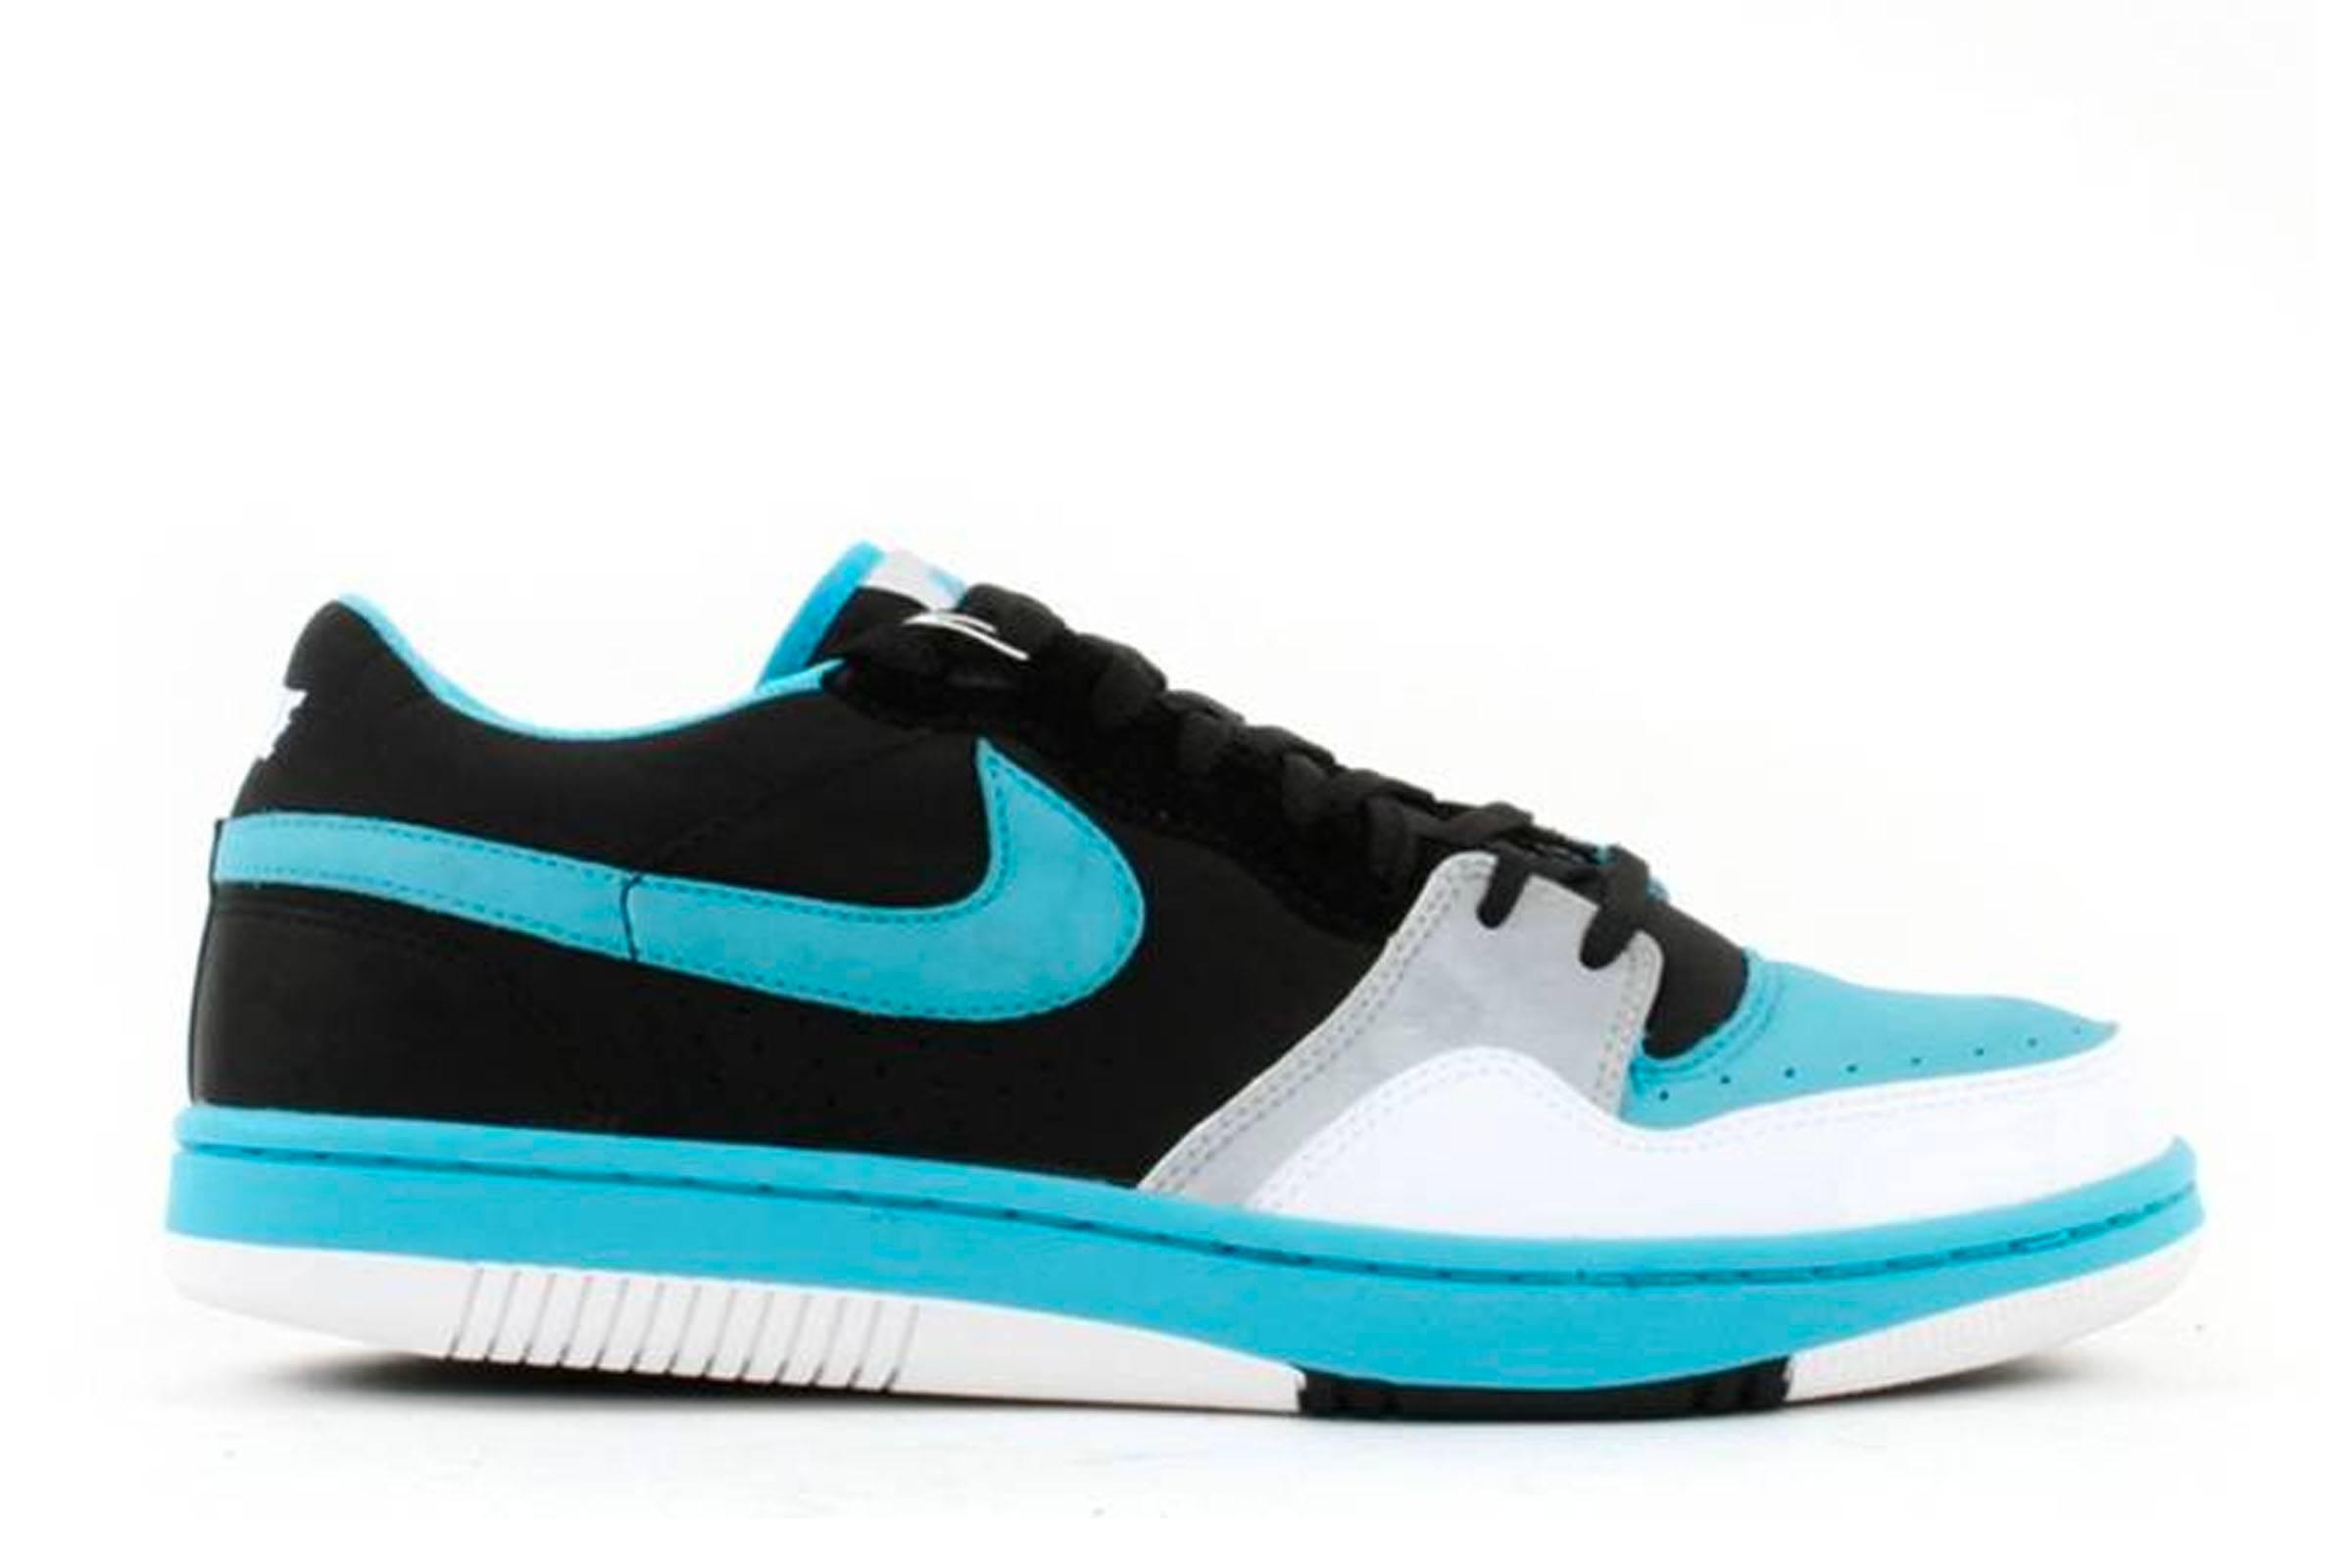 Stussy x Nike Court Force Low (2006)